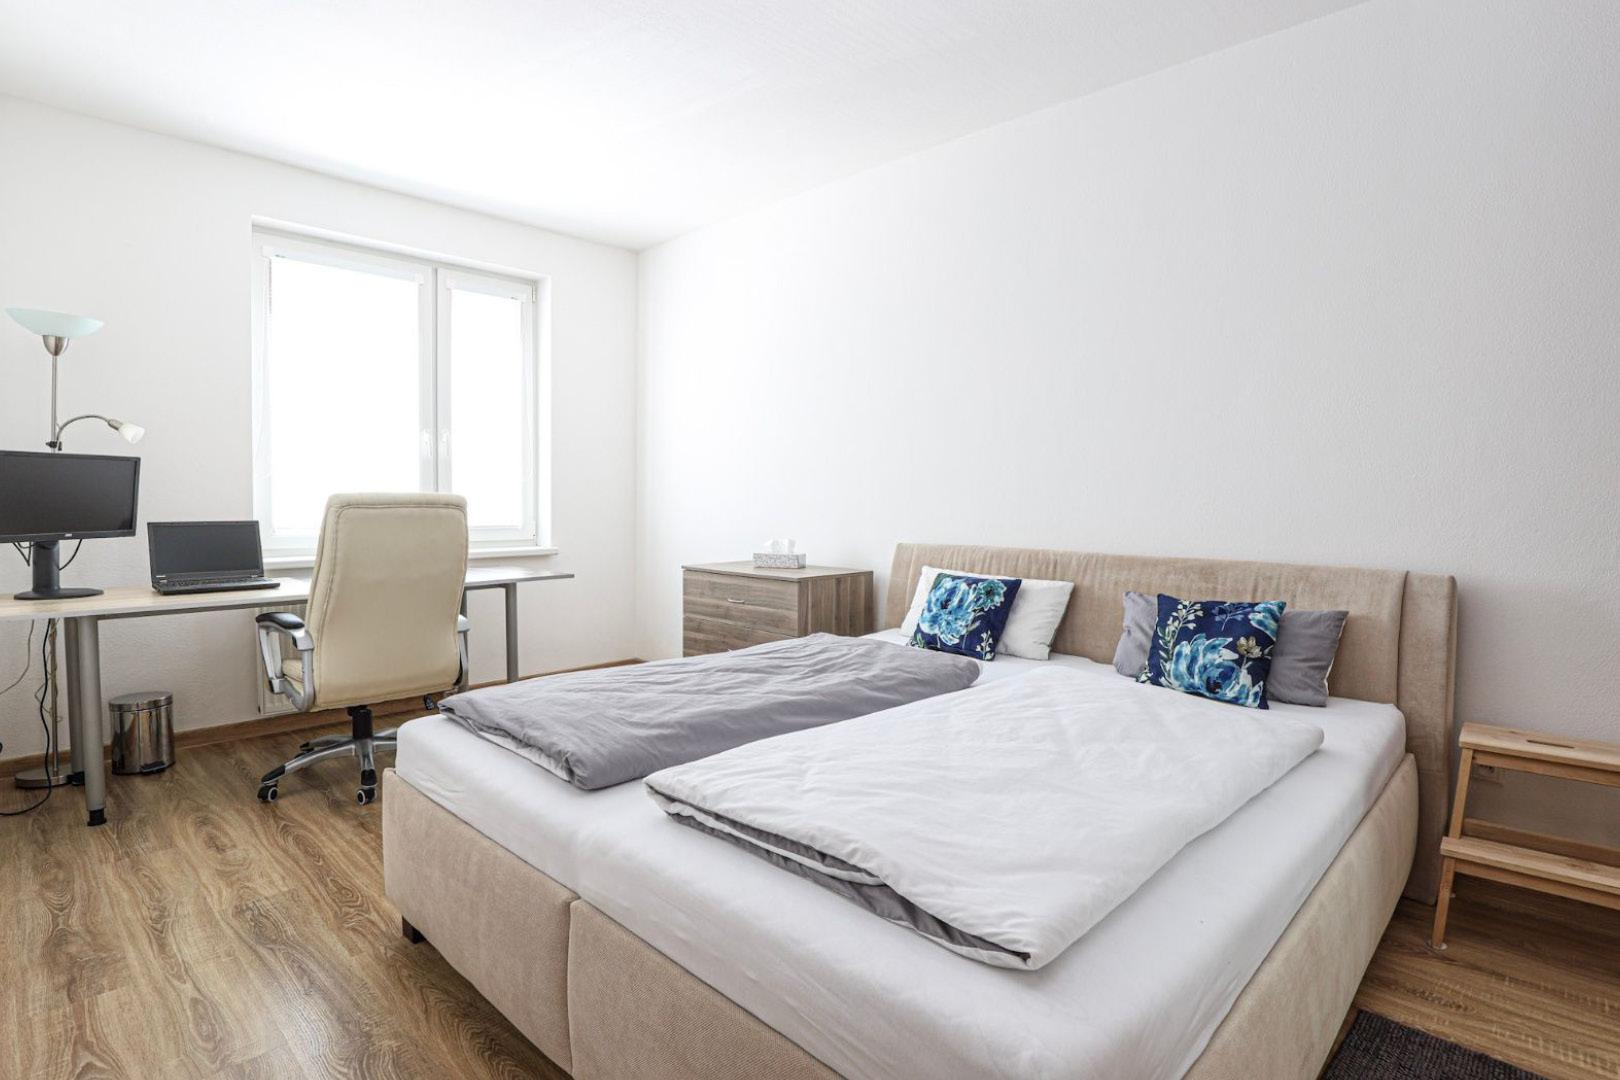 PRENAJATÉ | 2 izbový byt | Vyšehradská, Bratislava